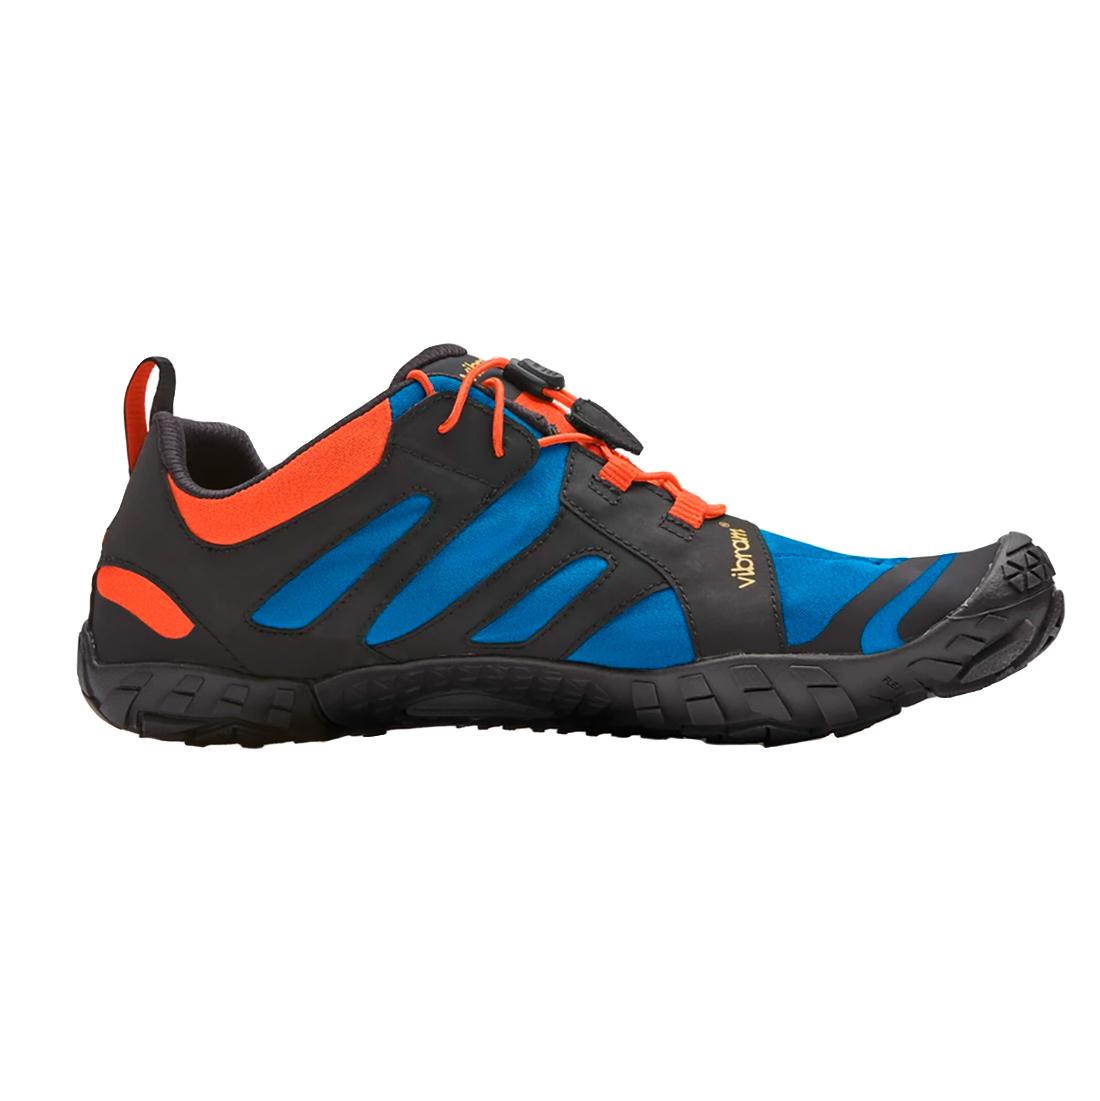 Barefoot Shoes | Webtogs